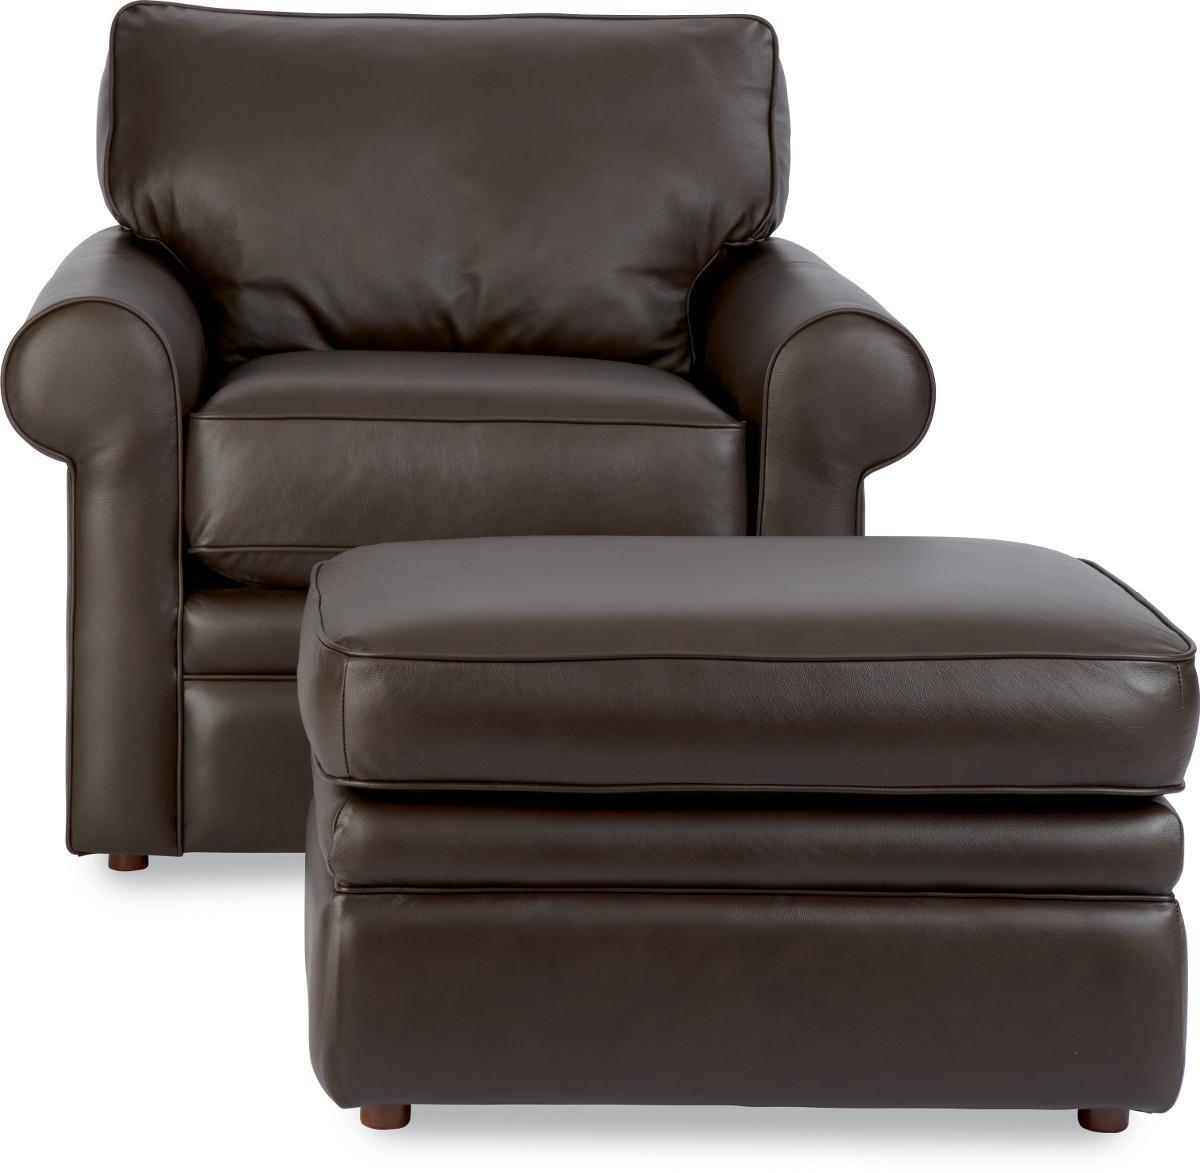 La-Z-Boy Collins Chair With Rolled Arms U0026 Ottoman   Zaku0026#39;s Fine Furniture   Chair U0026 Ottoman Sets